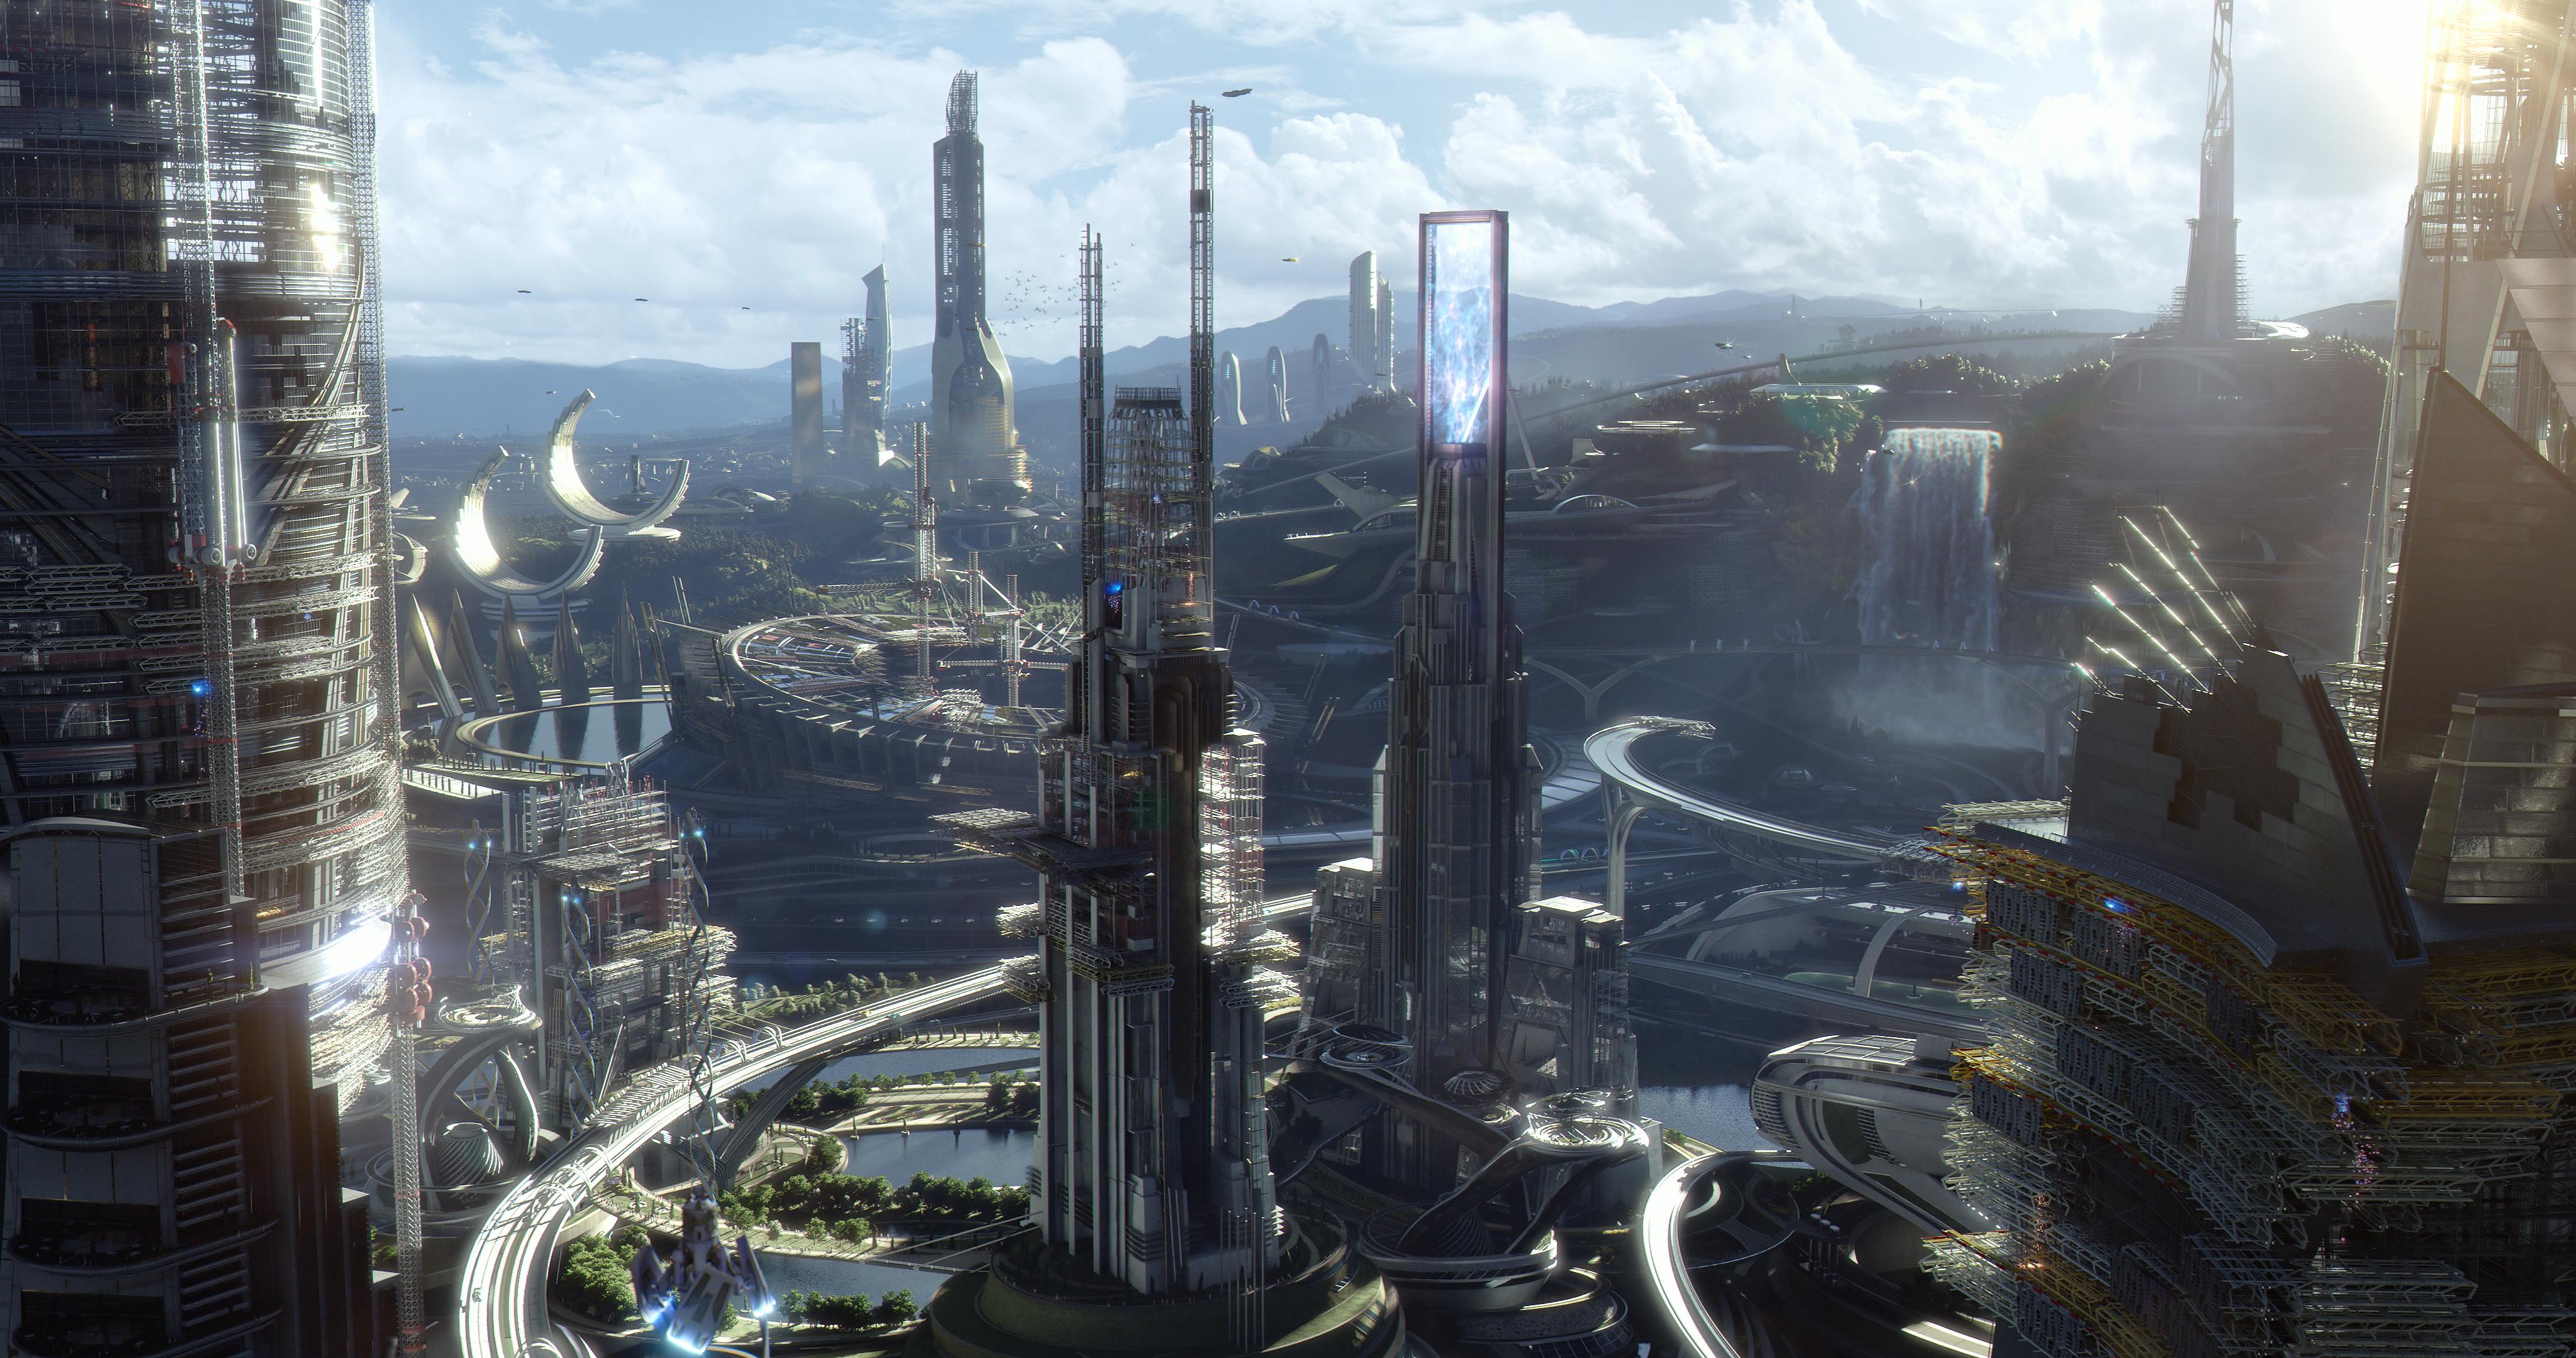 Tomorrowland (location)